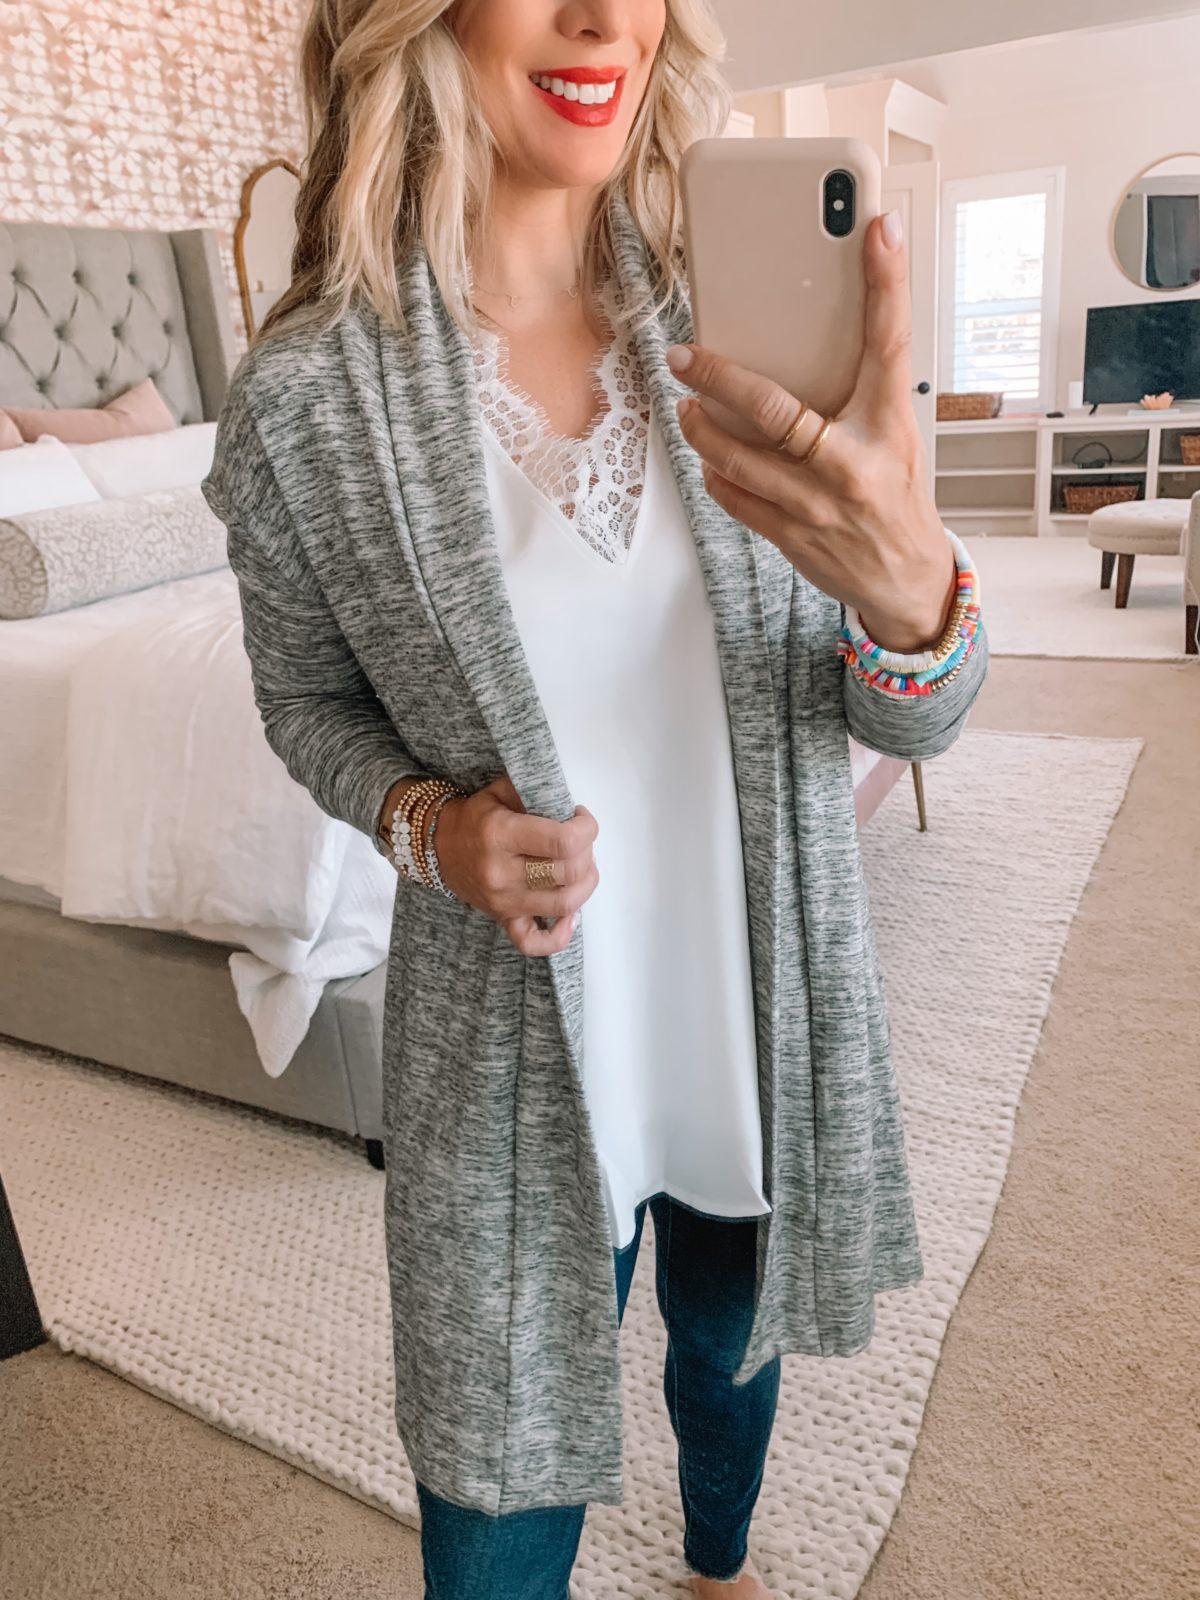 Amazon Fashion Finds, Cardigan, Lace VNeck Cami, Denim Jeans